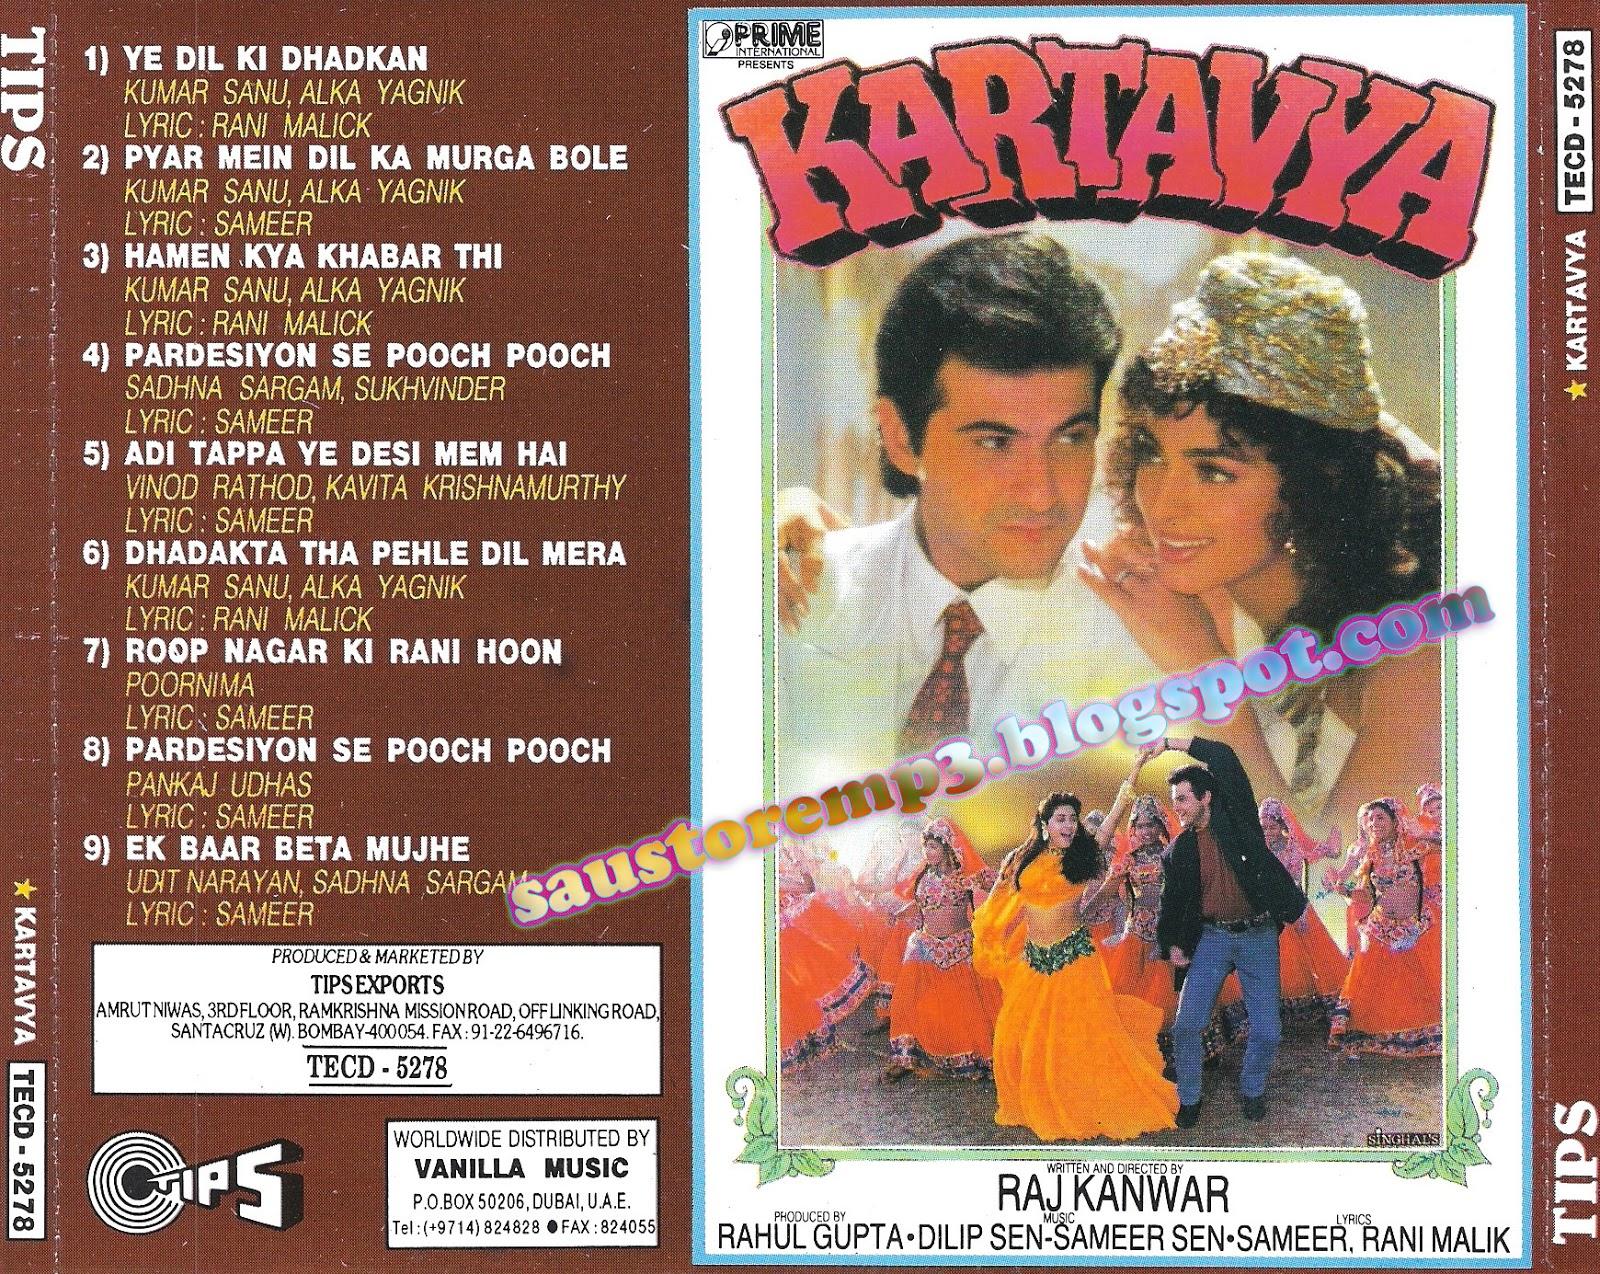 Kartavya sanjay kapoor mp3